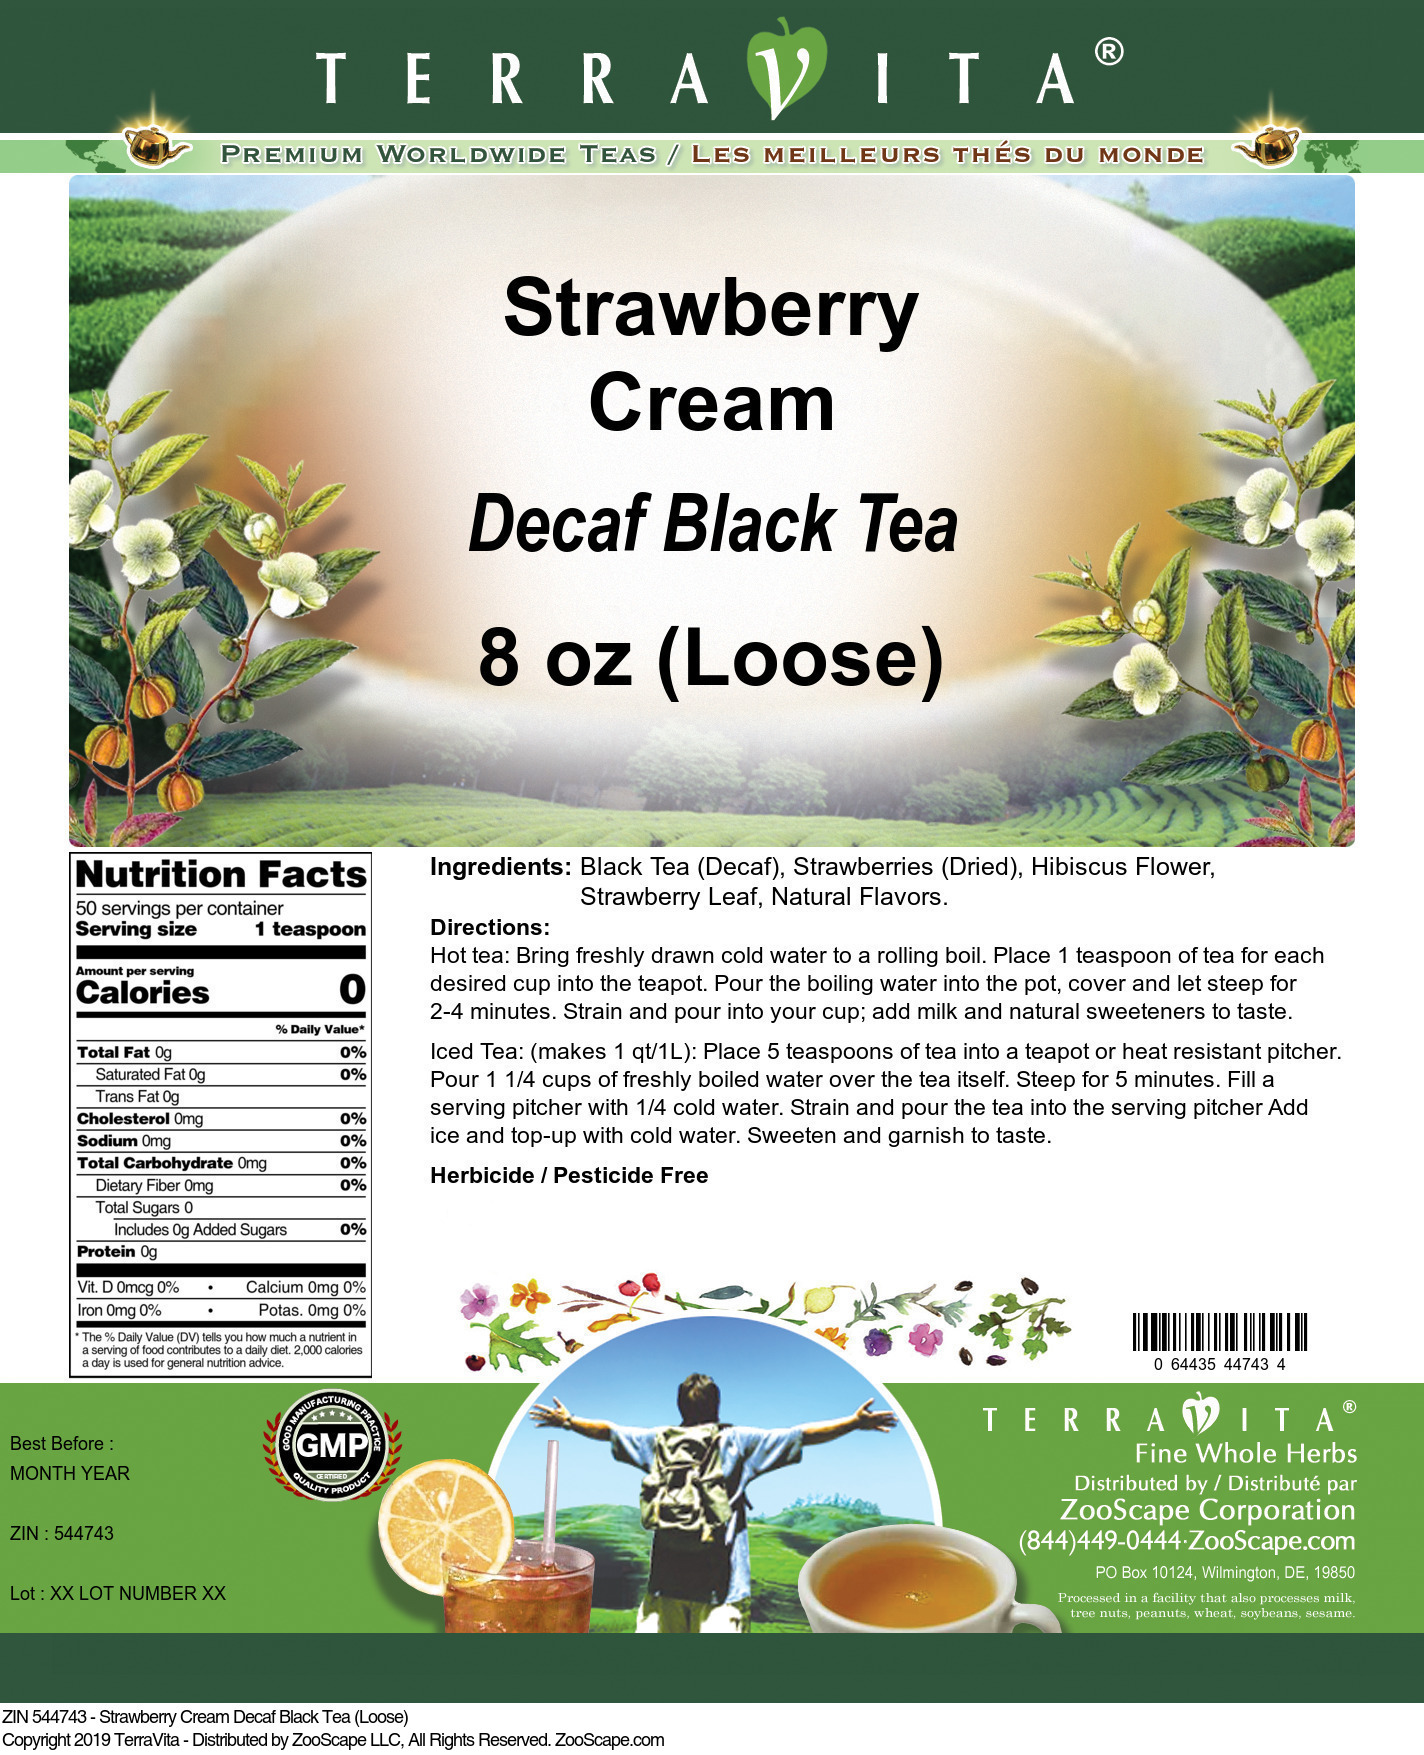 Strawberry Cream Decaf Black Tea